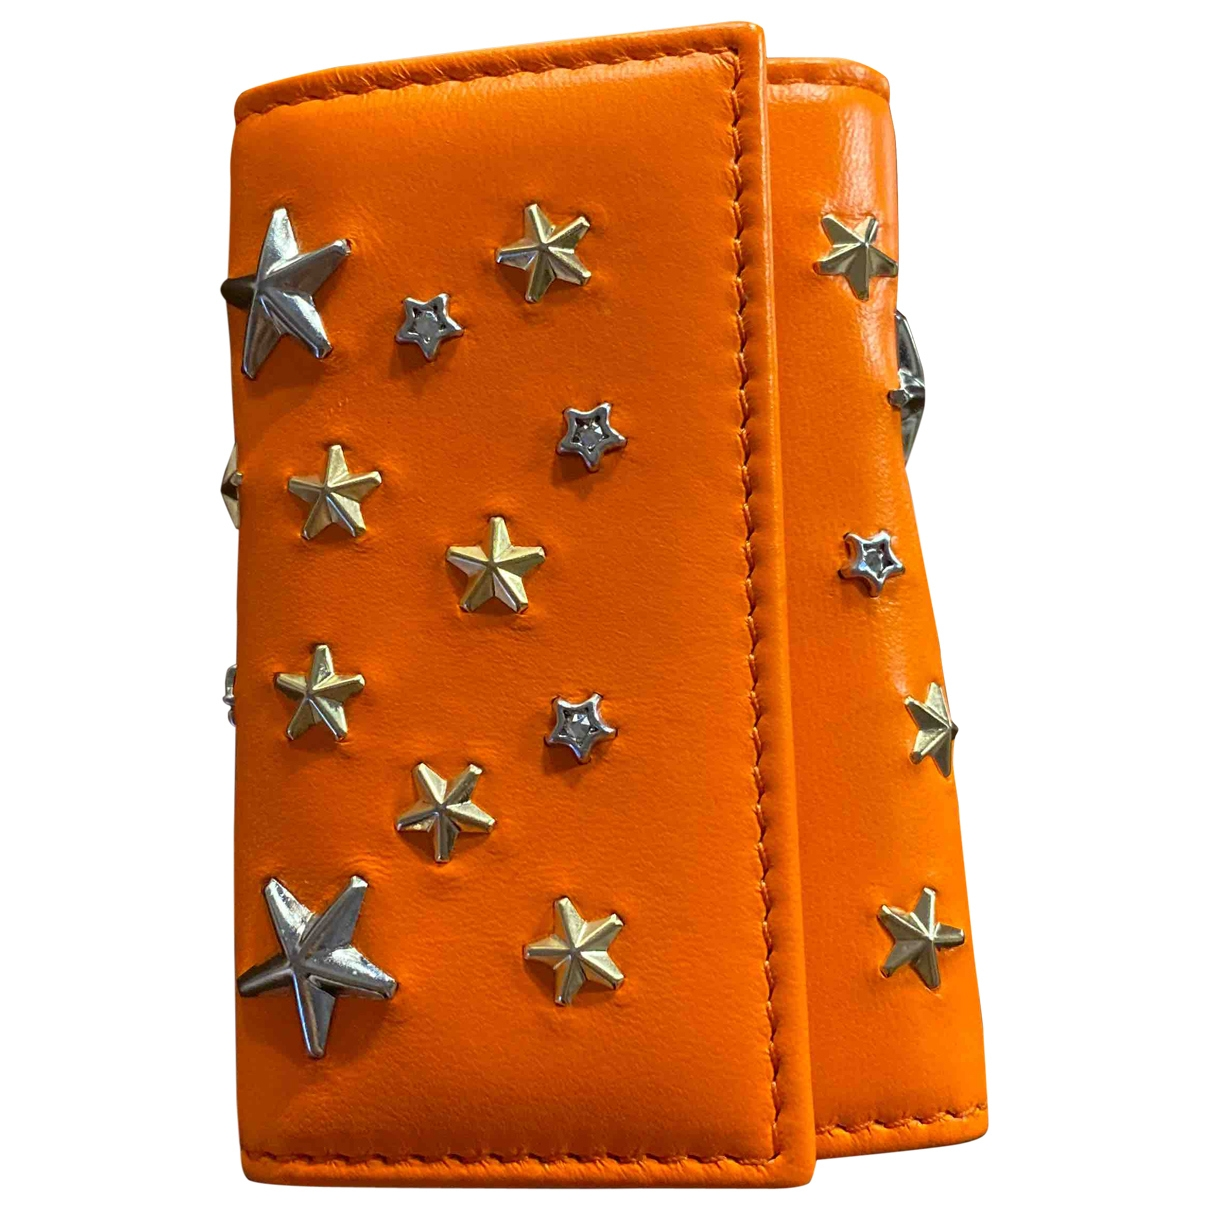 Jimmy Choo - Petite maroquinerie   pour homme en cuir - orange